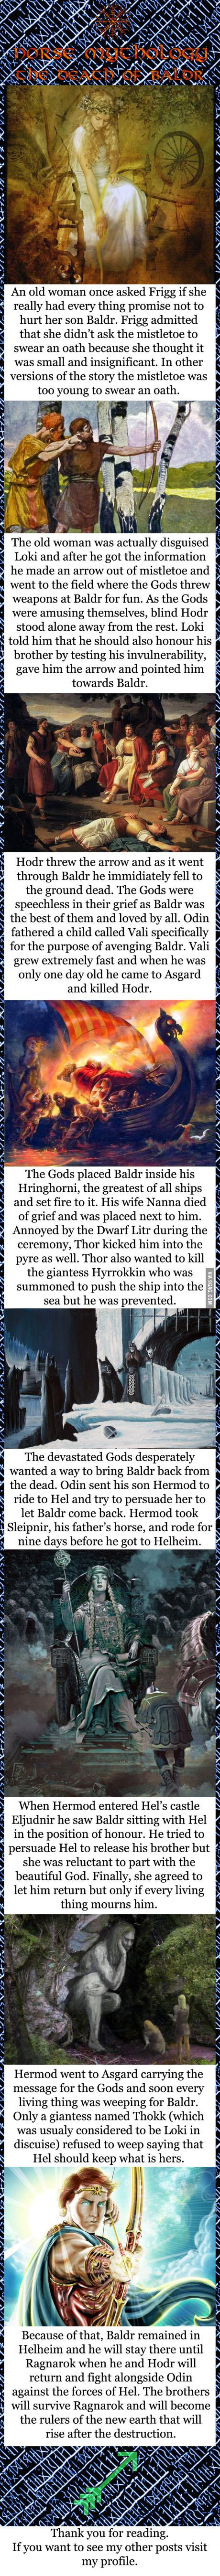 Norse mythology - The death of Baldr